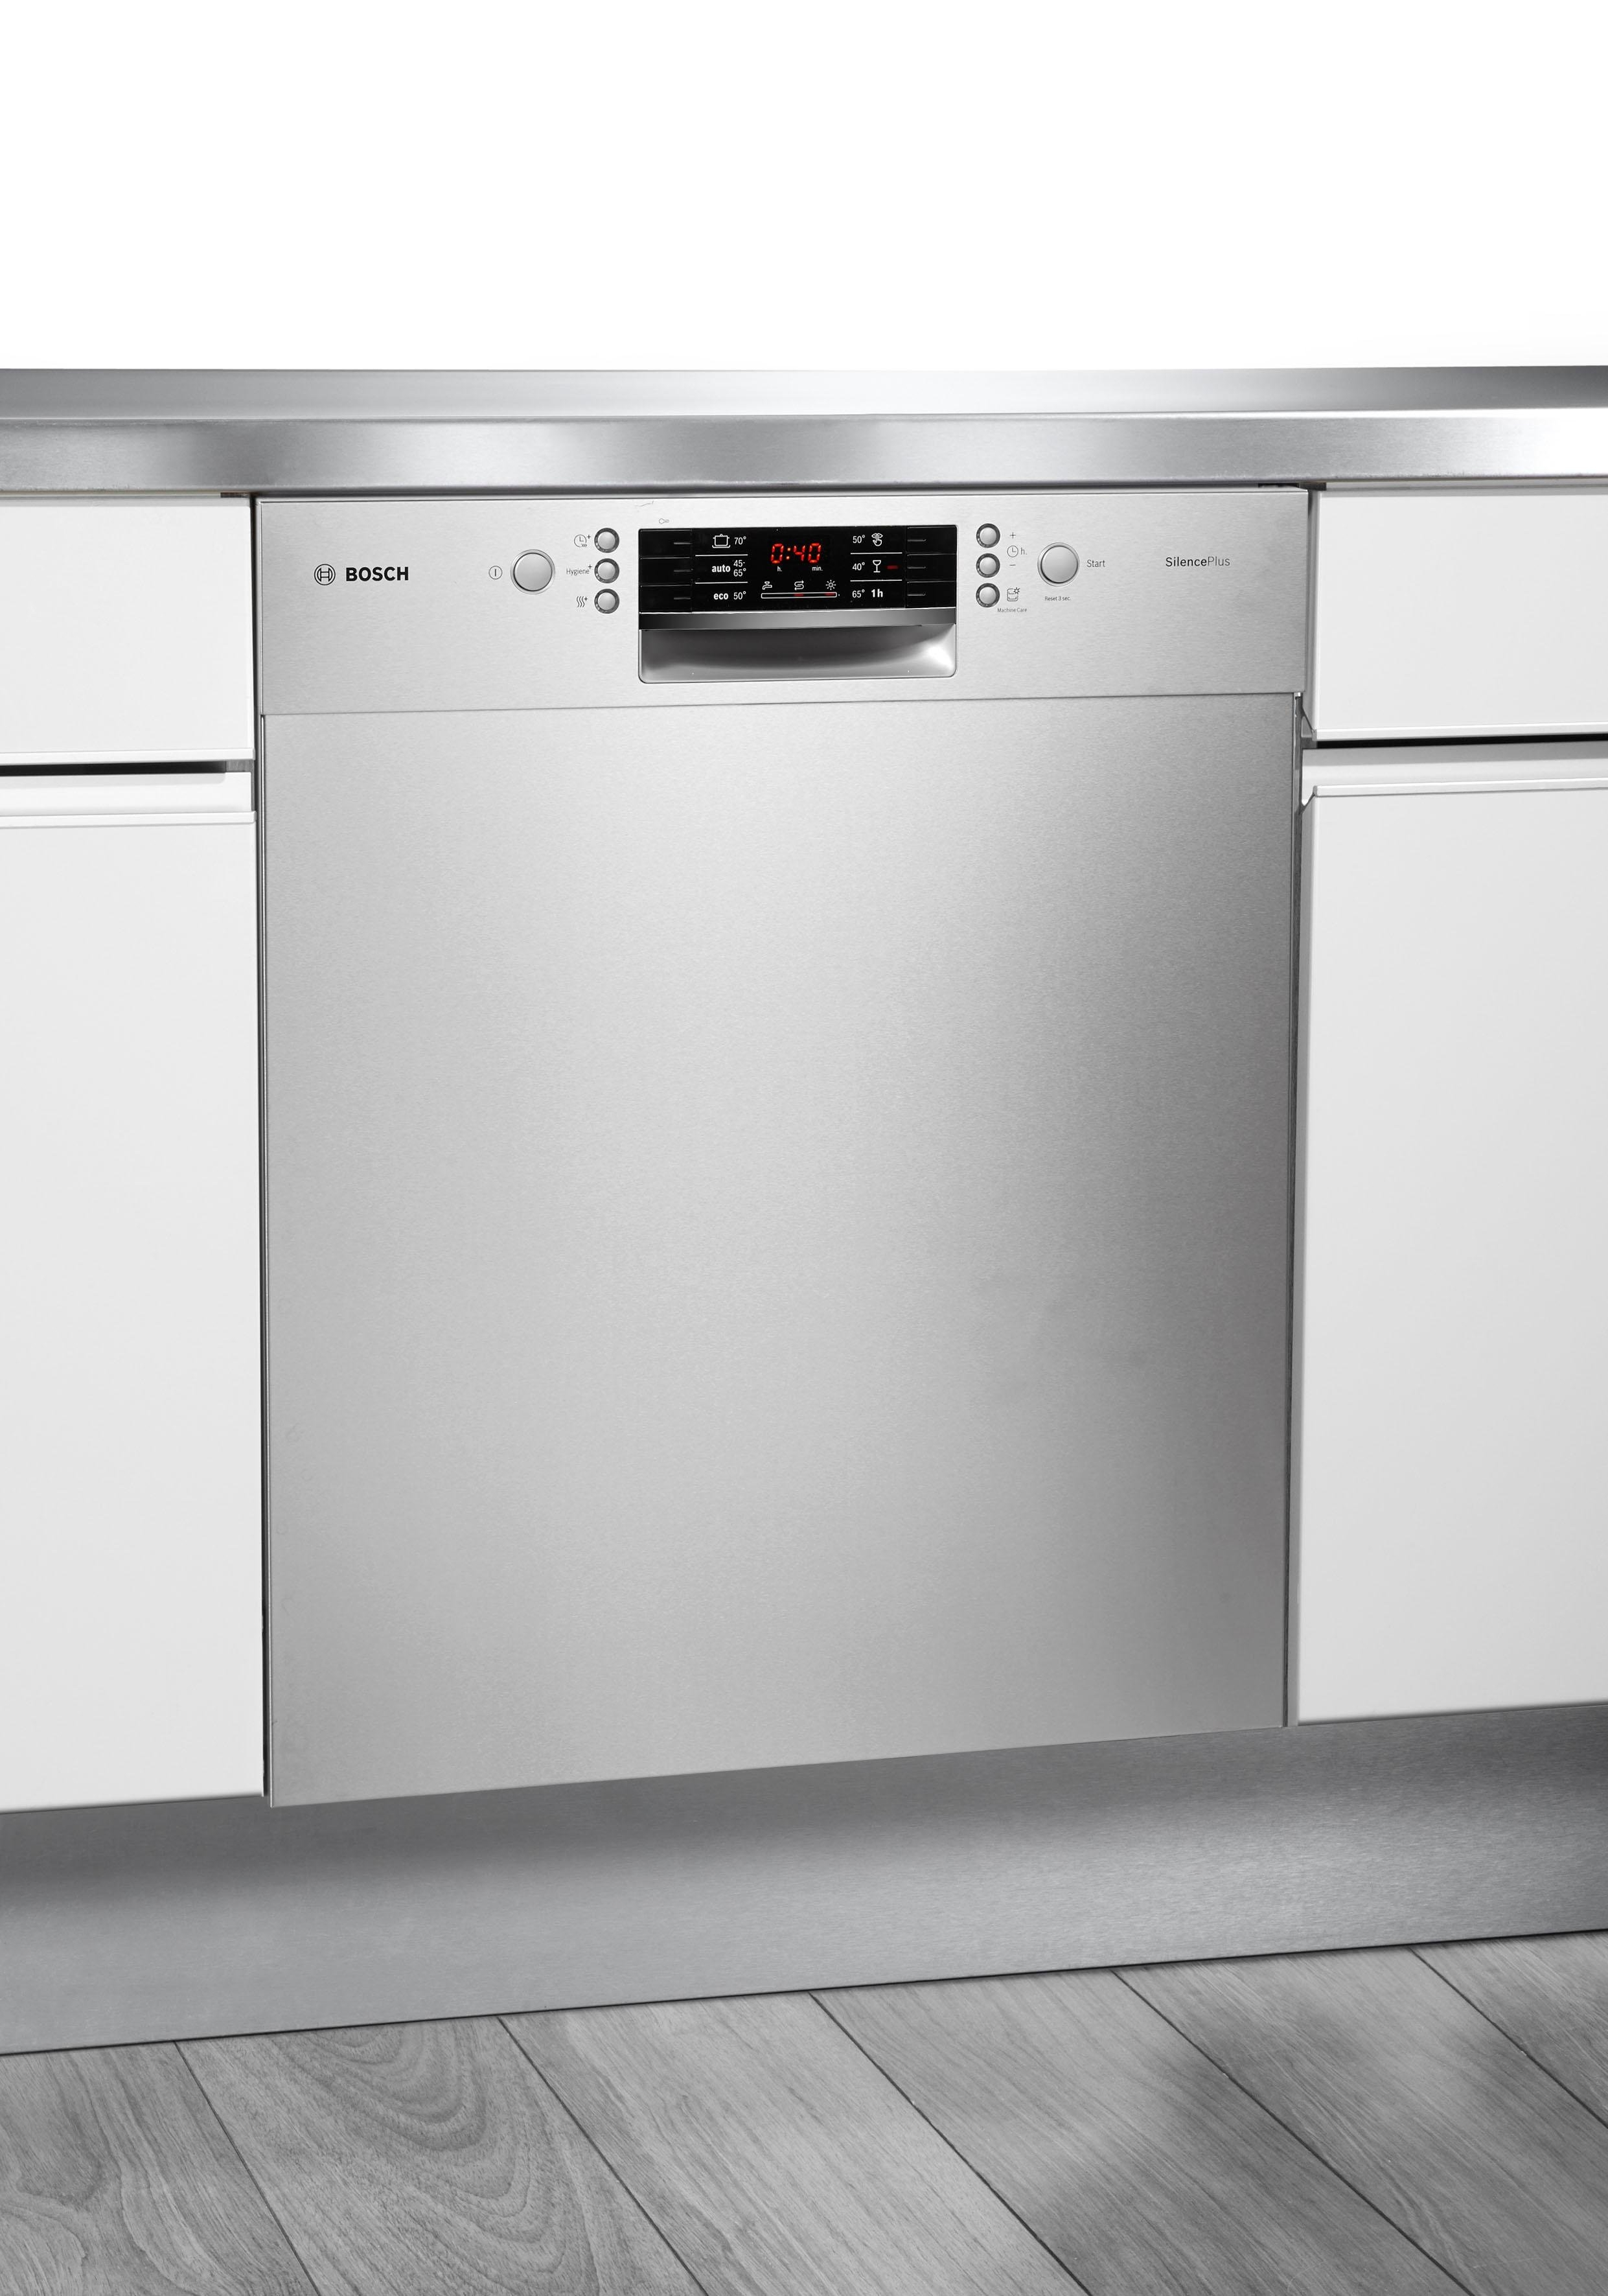 Bosch onderbouwvaatwasser Serie 4 SMU46CS01E, A+++, 9,5 liter, 13 standaardcouverts nu online bestellen